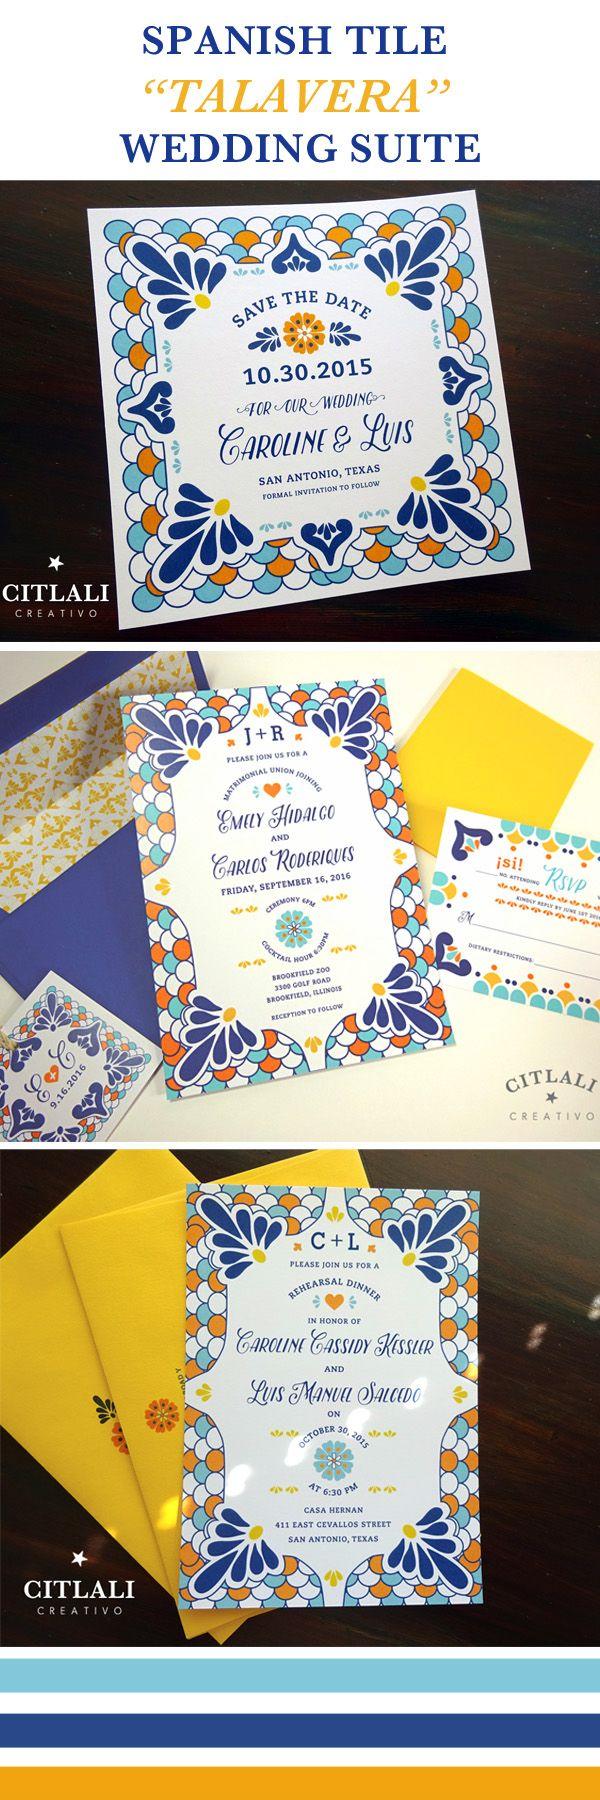 Talavera Spanish Tile Wedding Save The Dates Spanish Weddings And